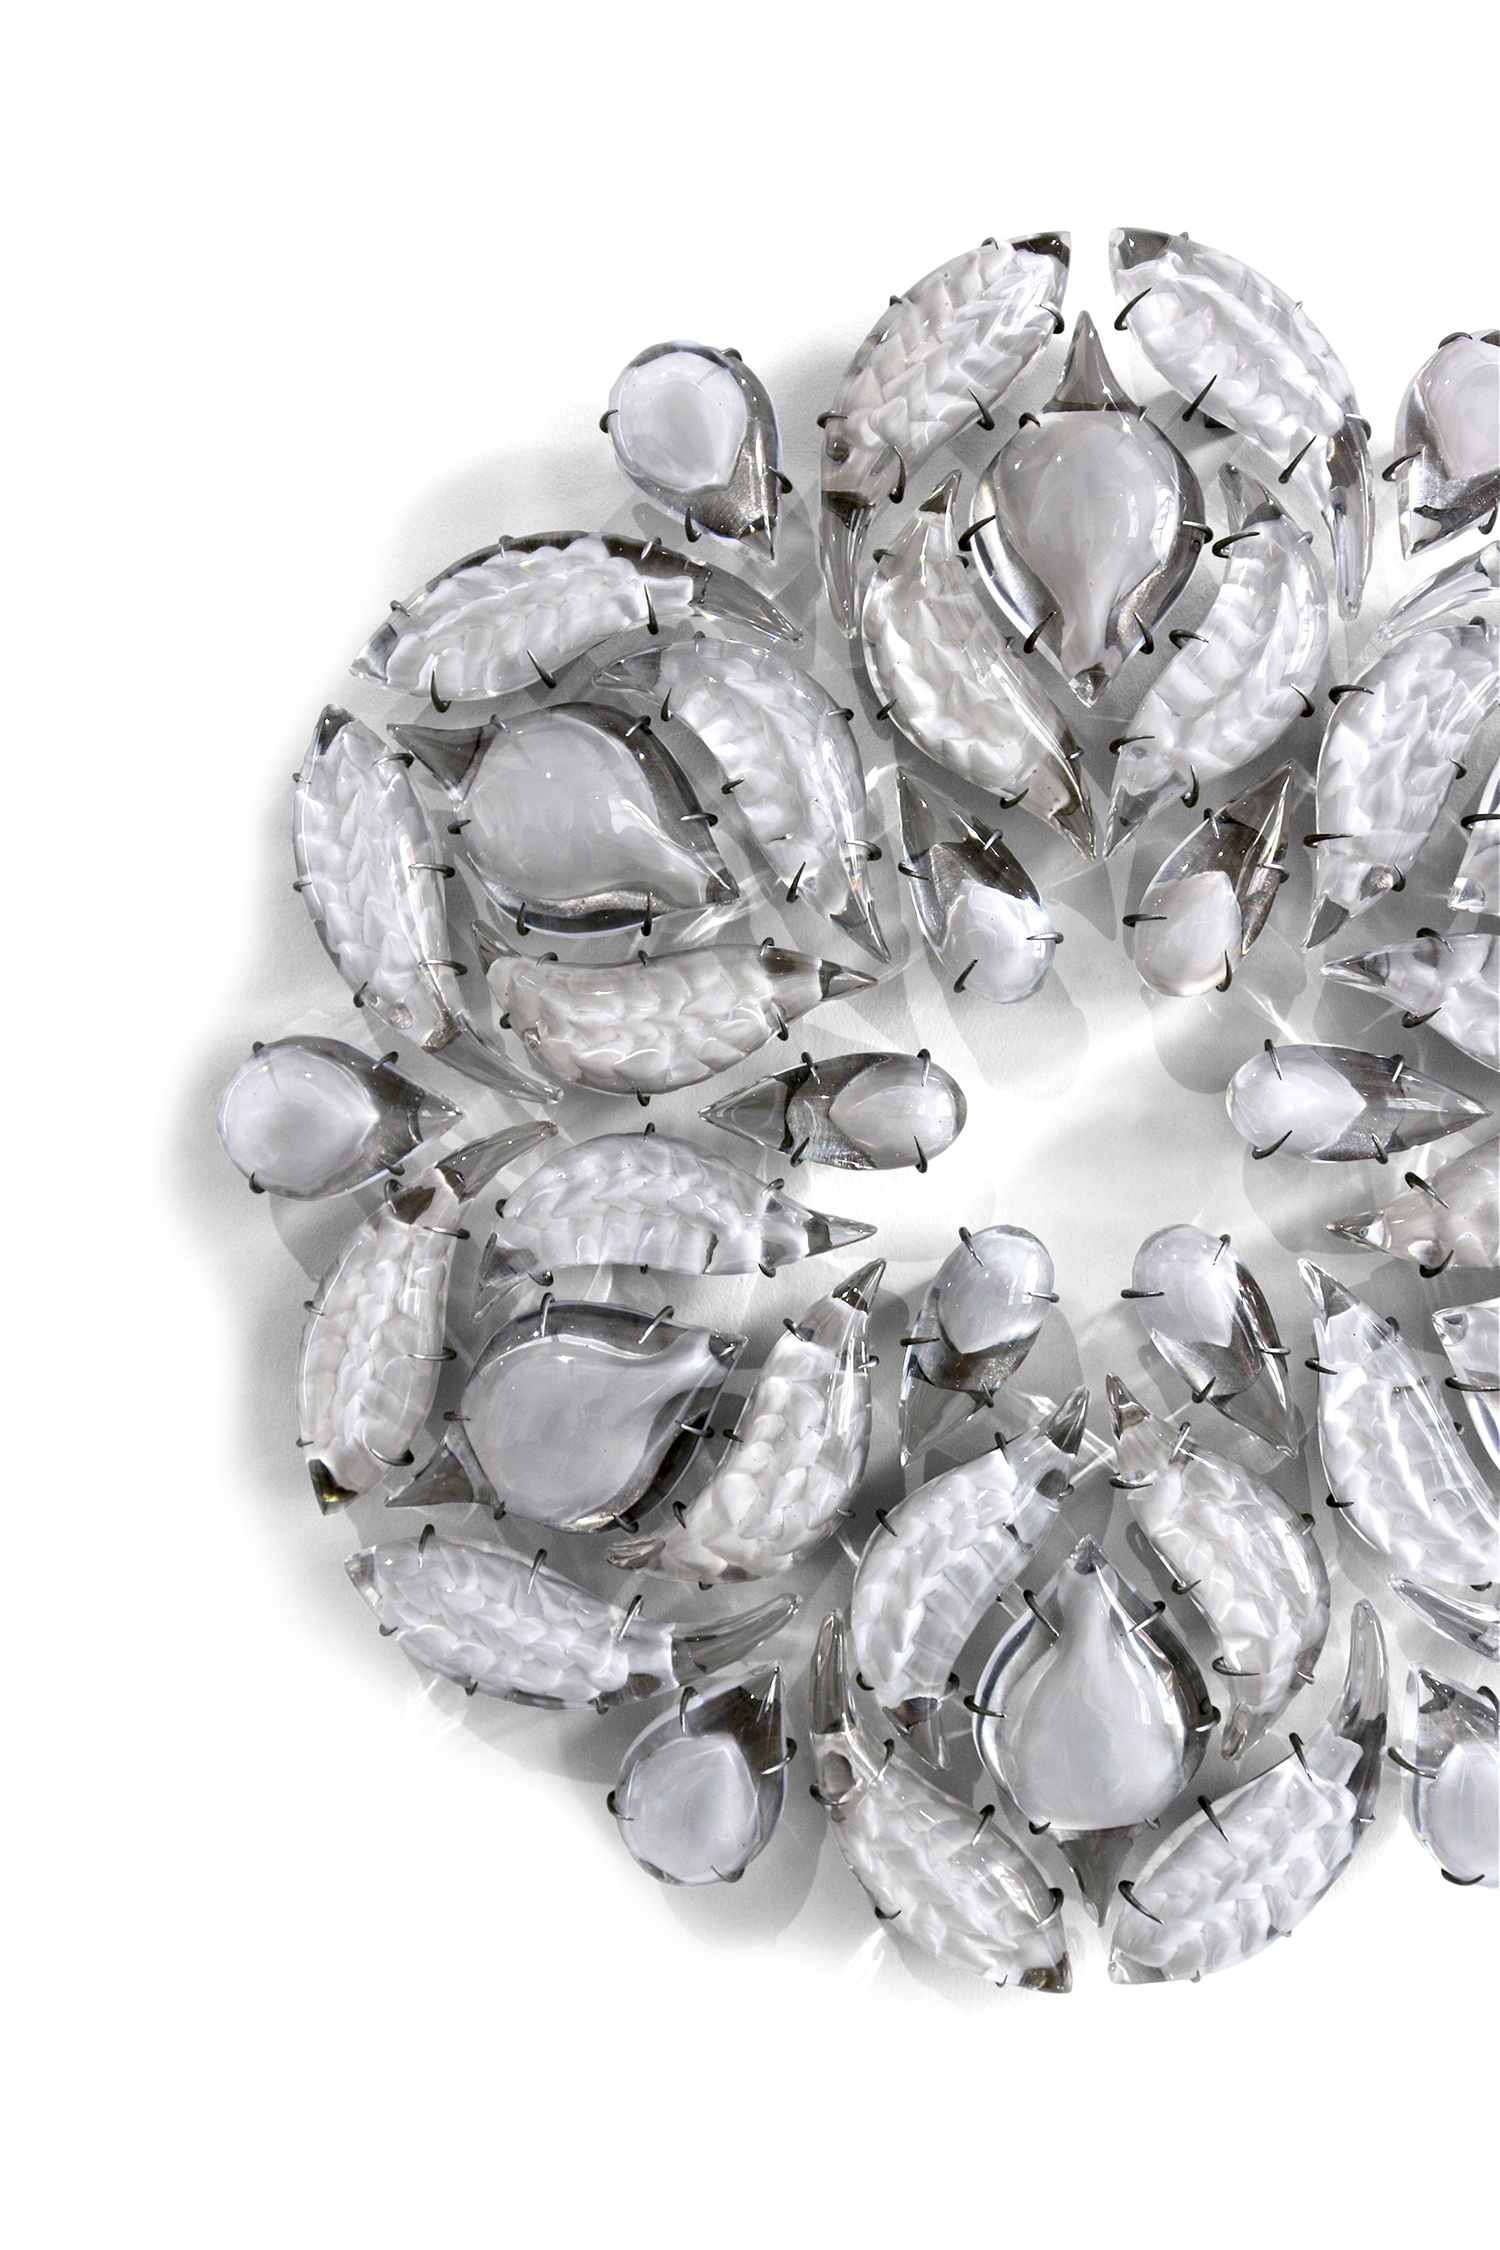 "'Demeter', 2017, Cast Crystal / Aluminum, 33.5"" x 33.5"" x 3.5"""